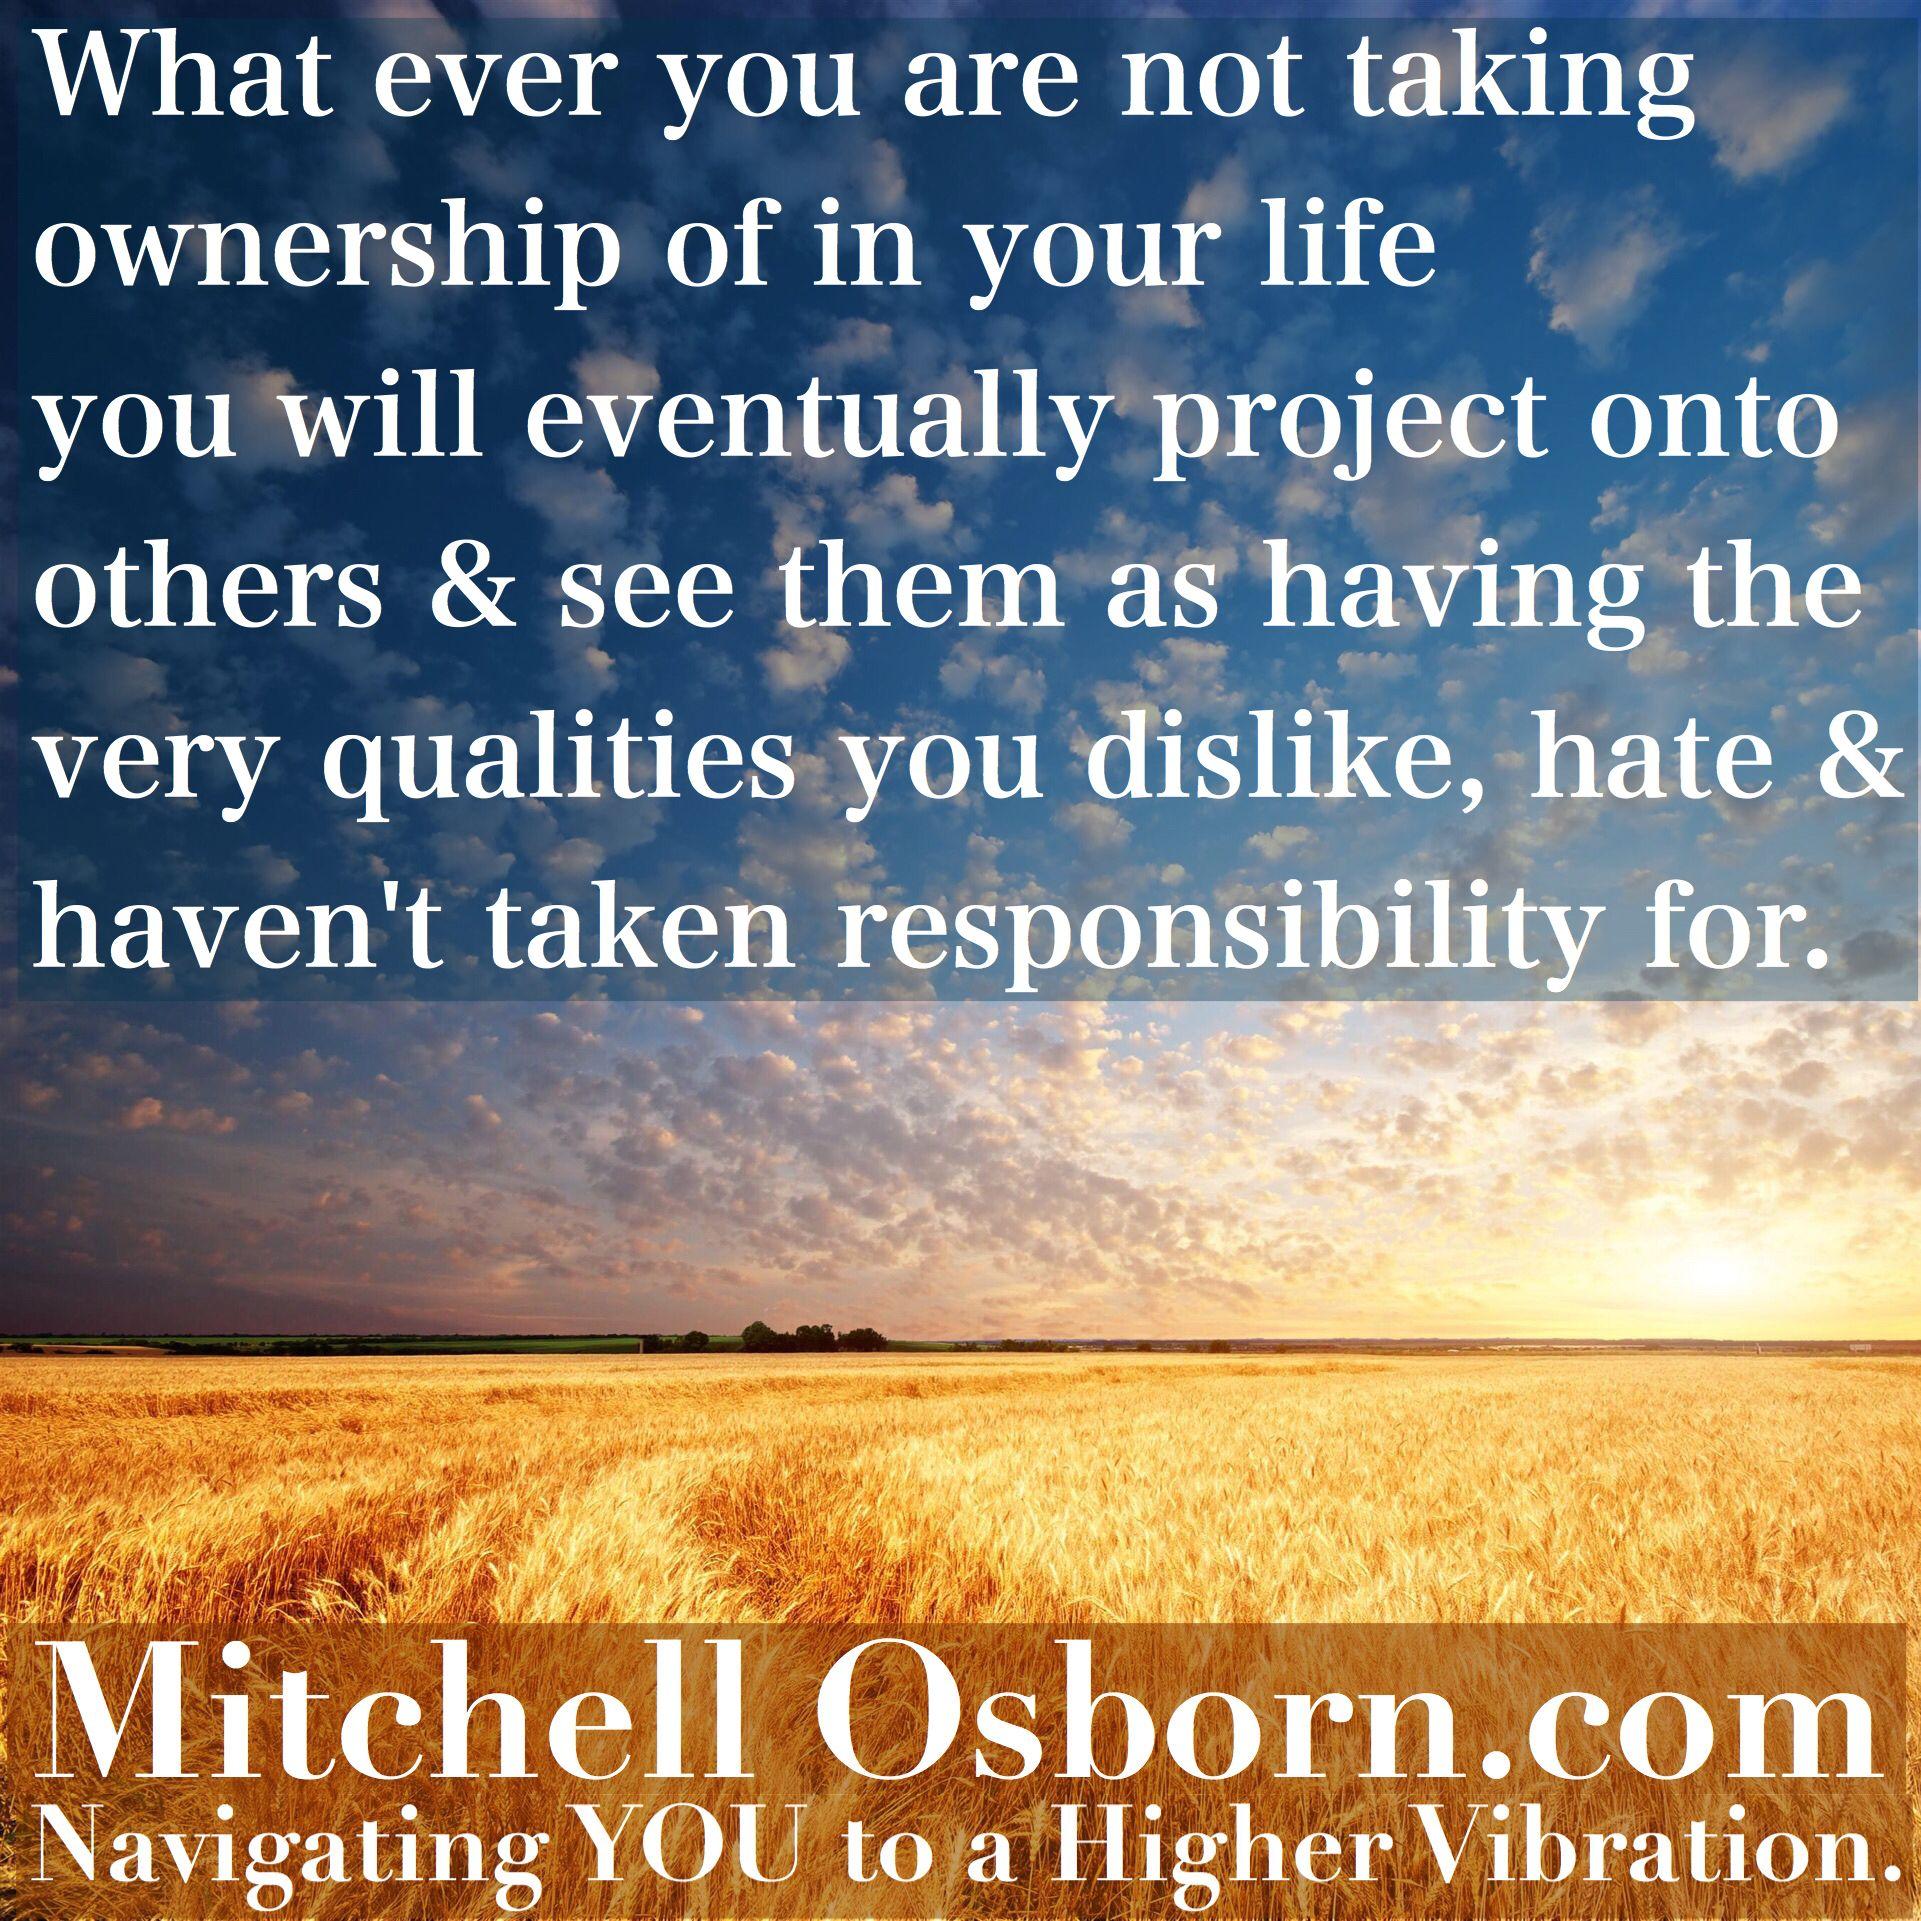 Intuitive words of wisdom. www.MitchellOsborn.com www.bit.ly/BOOKASESSION www.YouTube.com/IntuitiveMitchell #WUVIP #wellnessuniverse #psychic #petpsychic #tarot #medium #mitchellosborn #intuitivesoulcoach #soulcoach #dreaminterpretor #hypnotherapy #lenormand #wufriends #mitch #osborn #OrlandoTarotTribe #orlandostrong #pulse  #pulseorlando #orlandounited #hypnosis #mitchellosbornhypnotherapy